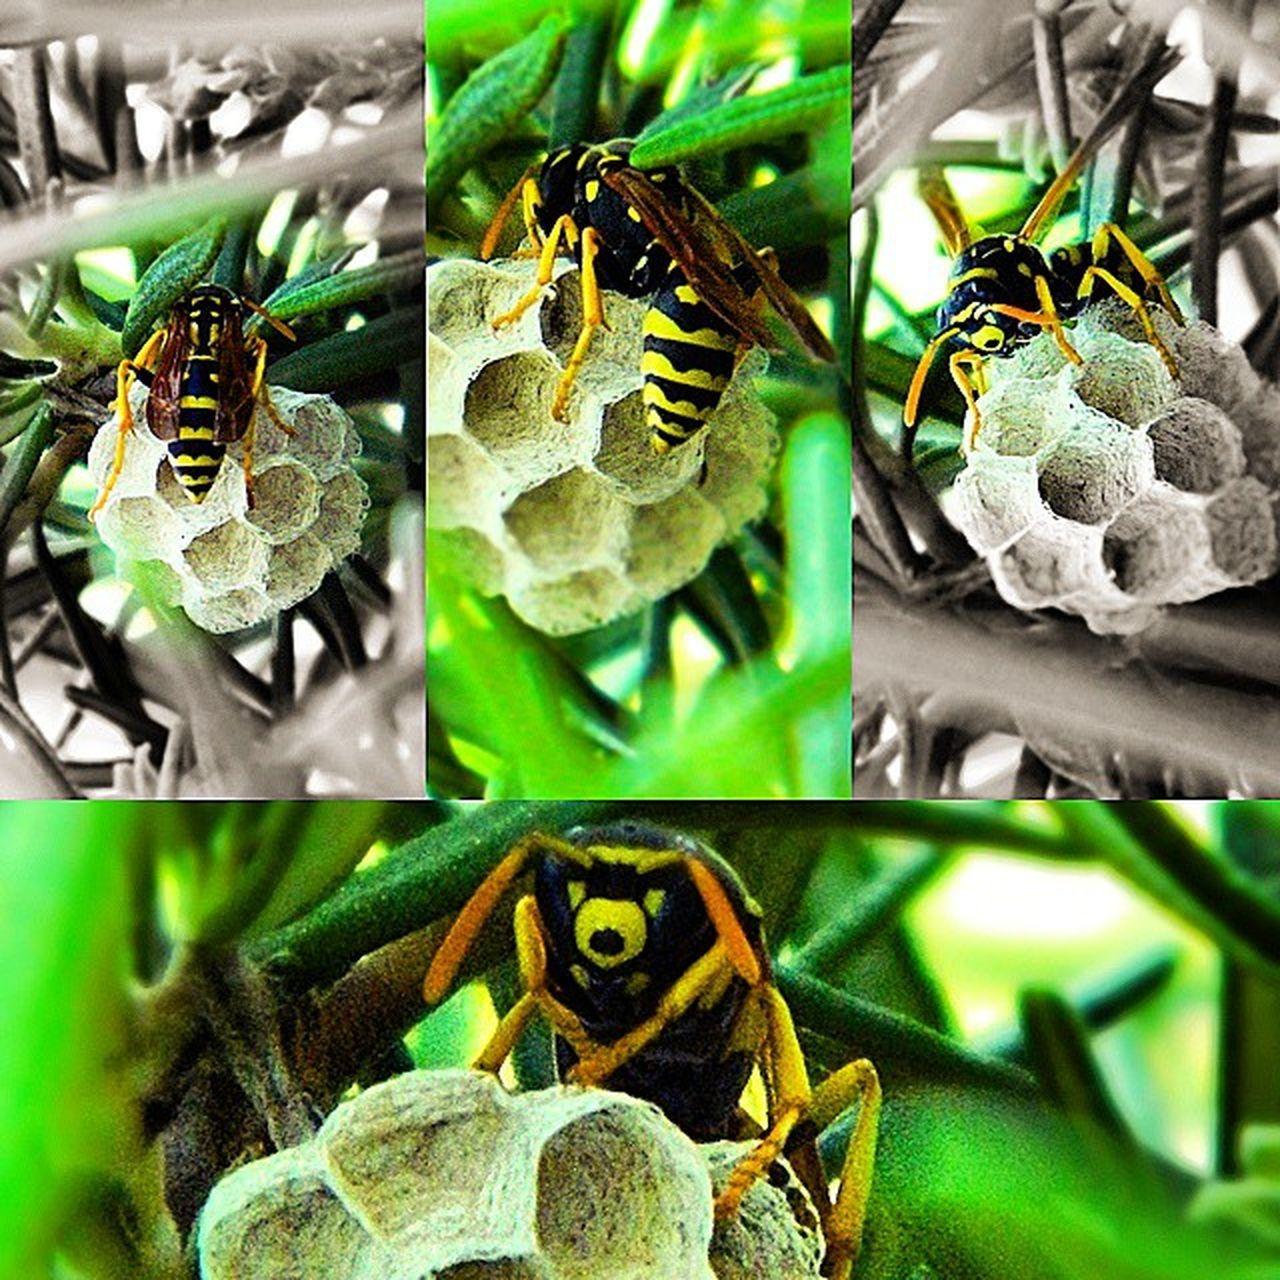 Nature Ape Piccoloinsettoalavoro Workinprogress nido geometricform picoftheday scoprirelanatura photography ❤📷